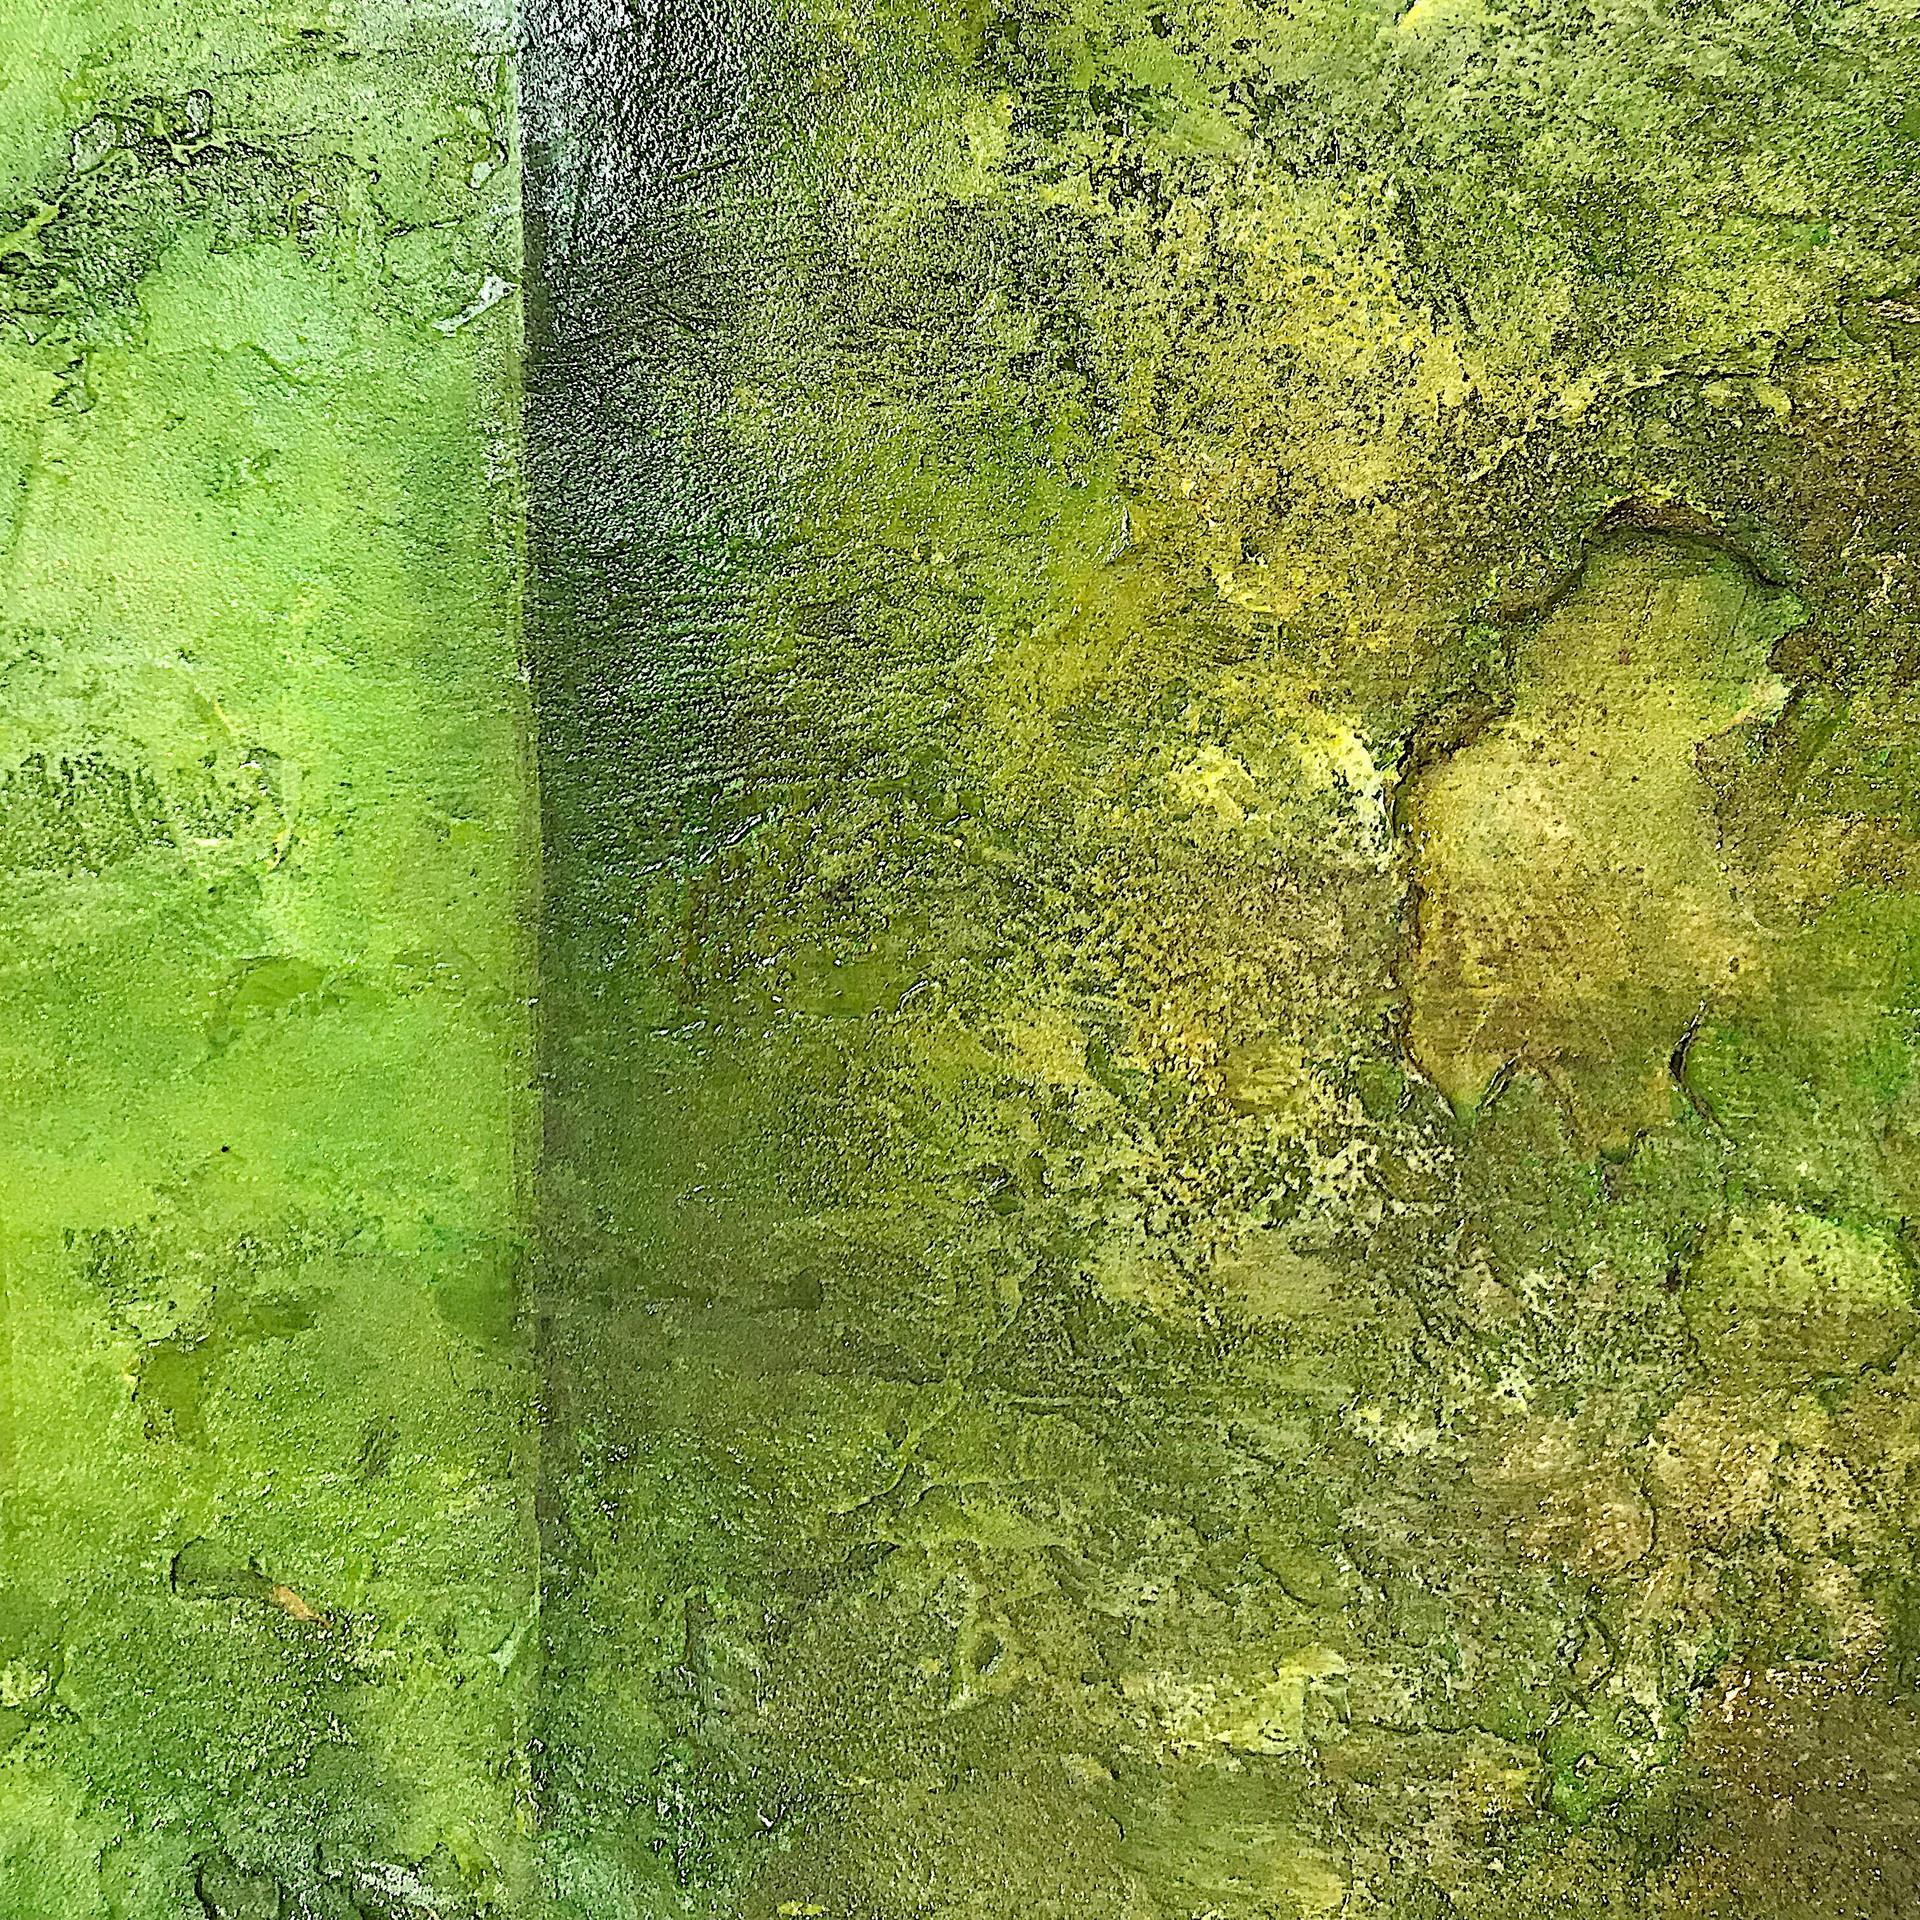 Green Room - Detail